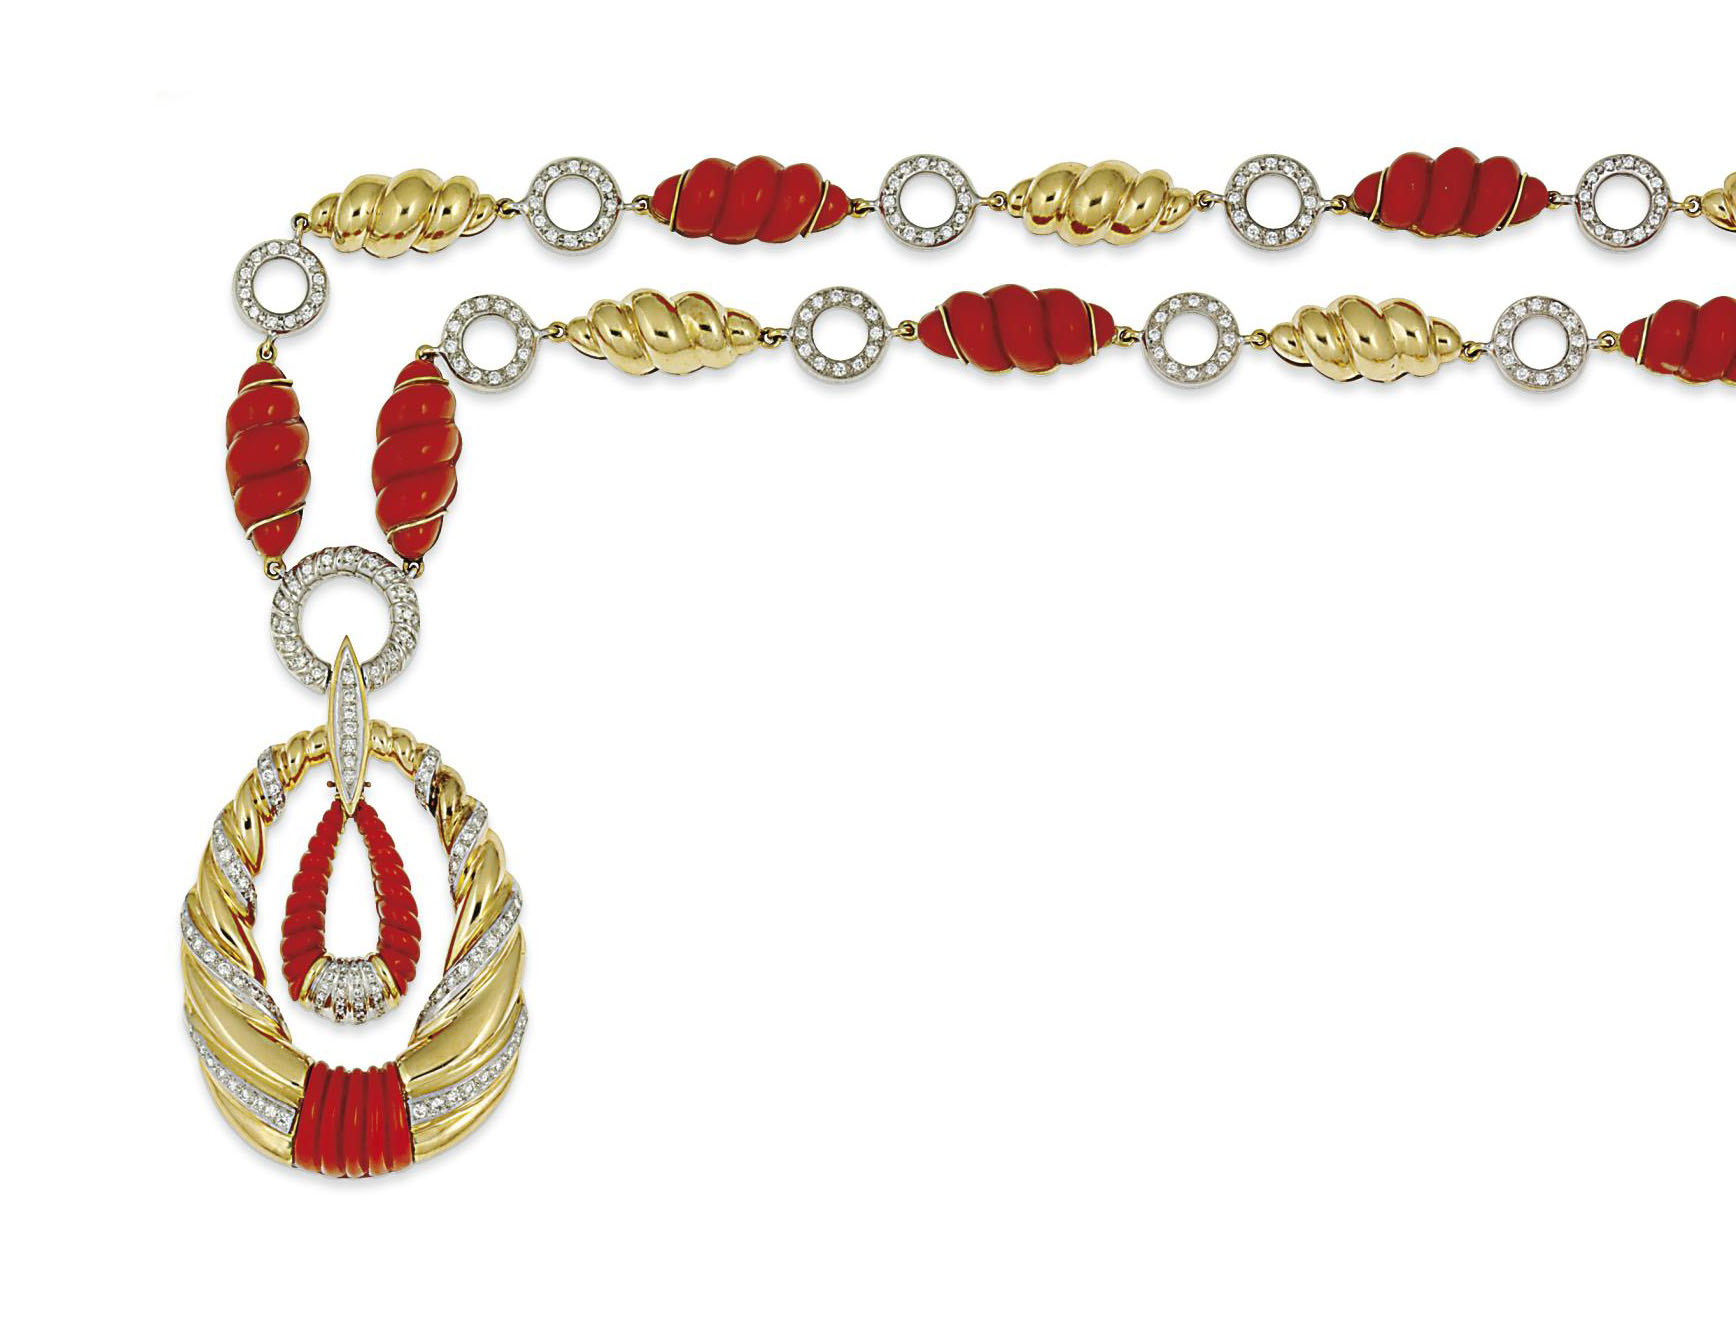 A coral and diamond-set pendan